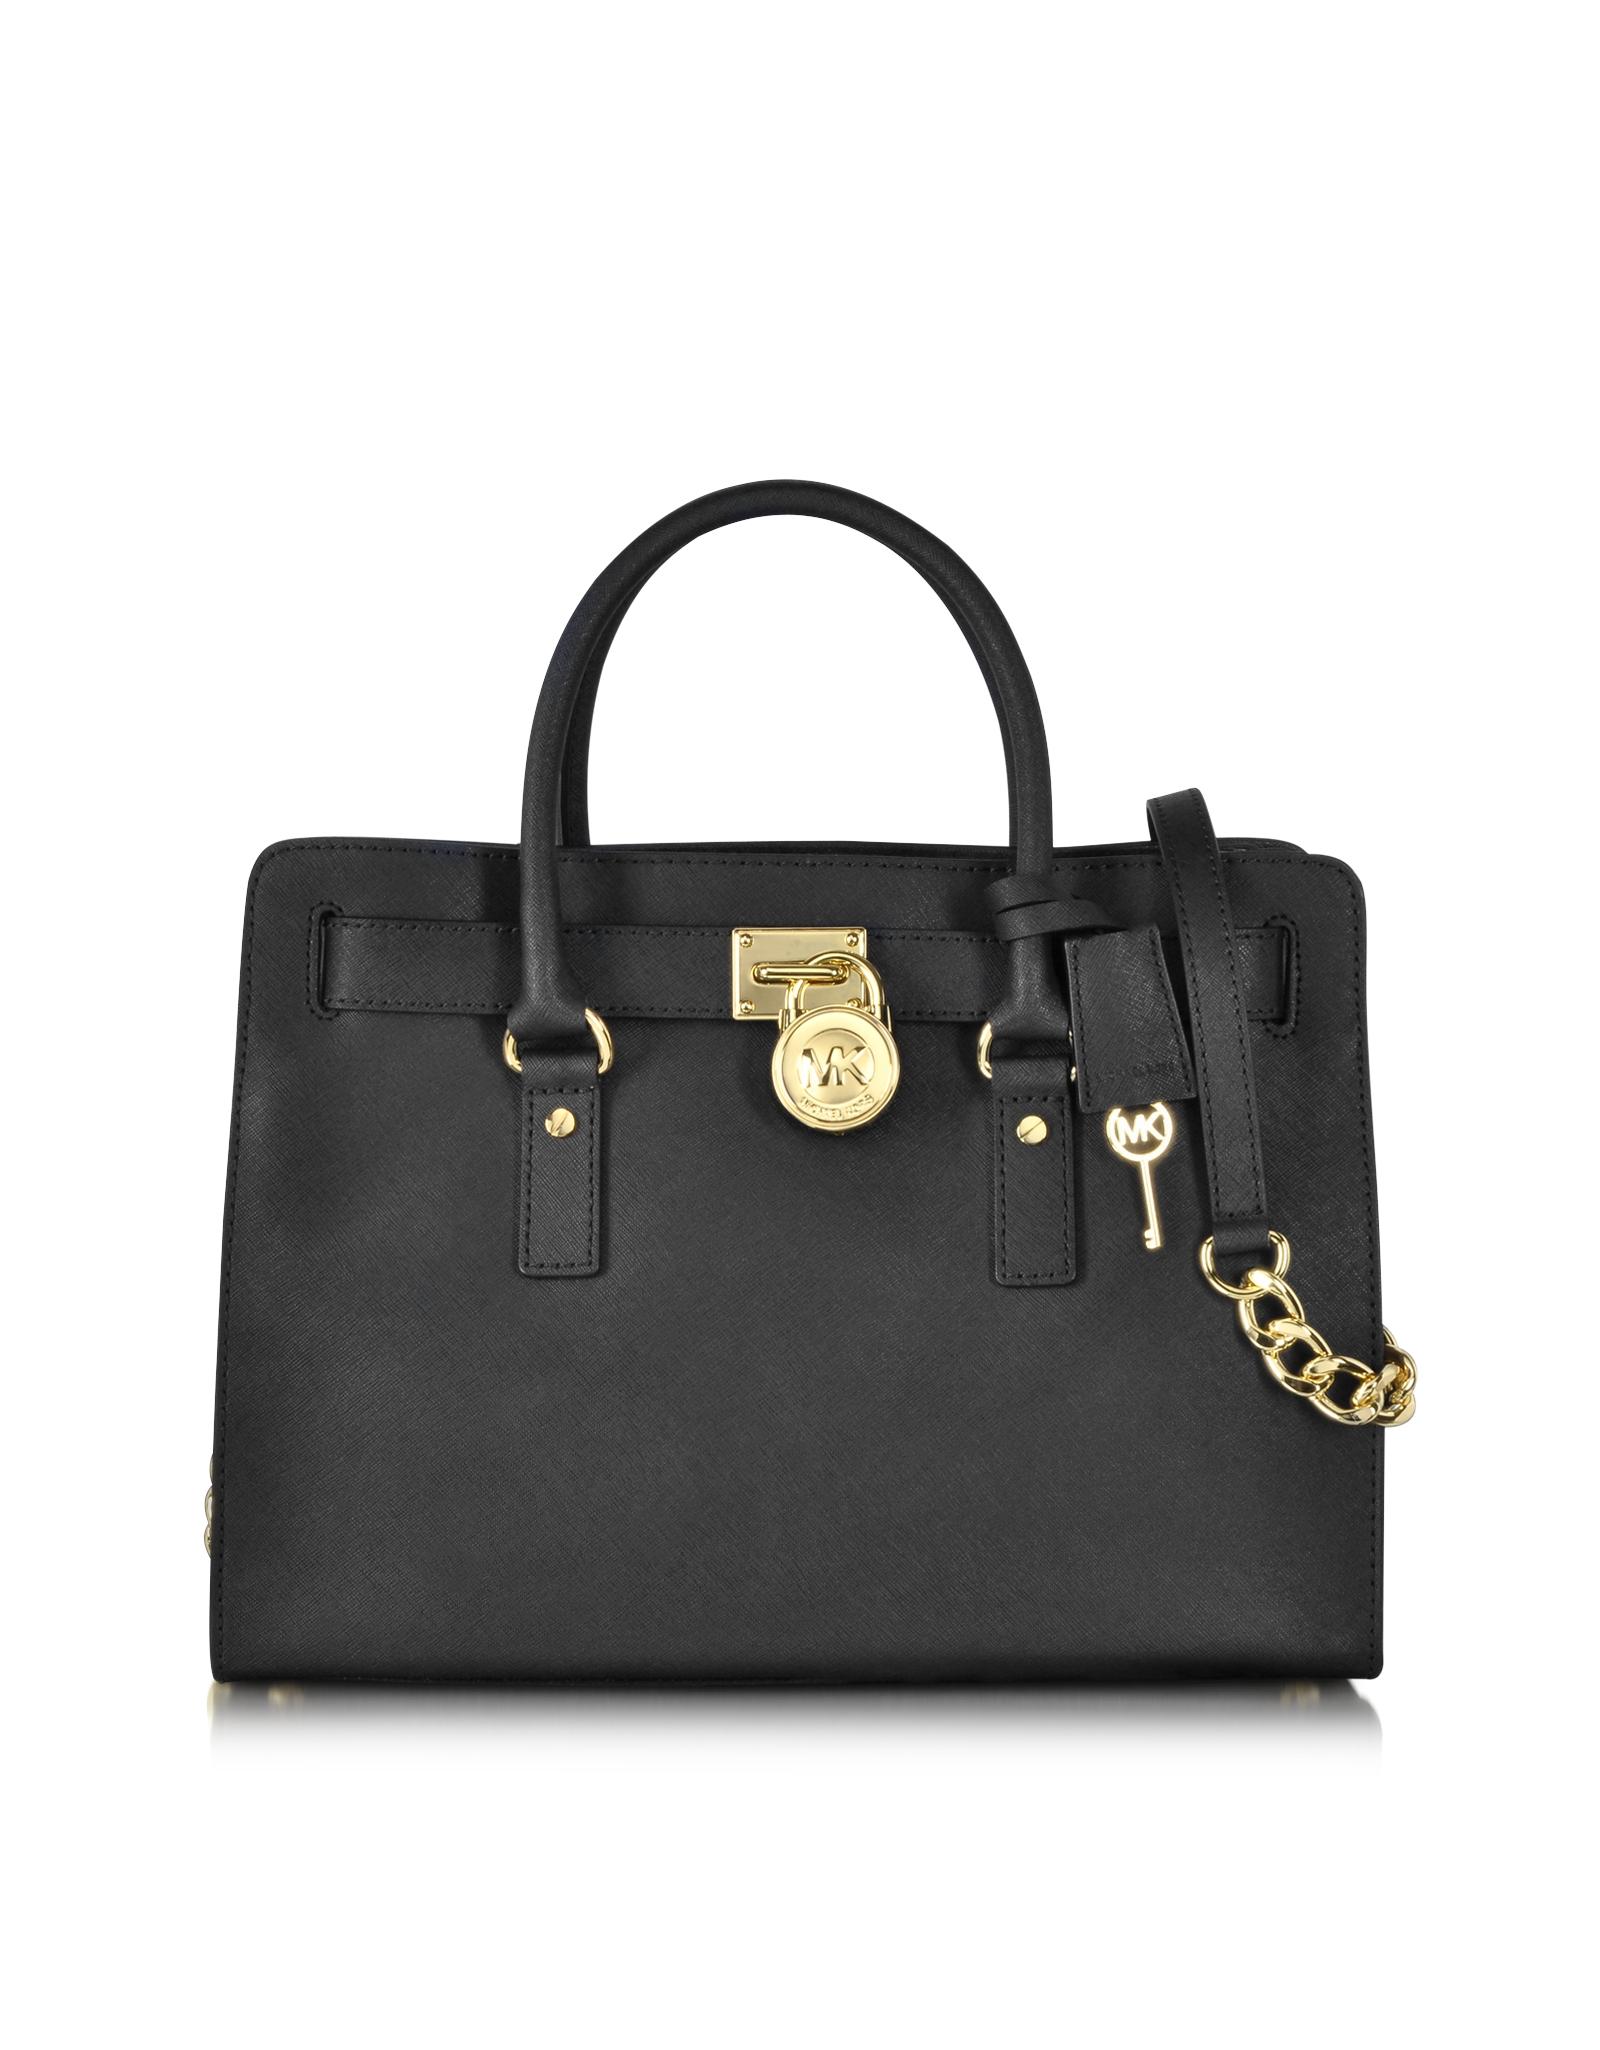 752788a09ab7 Lyst - Michael Kors Hamilton Large Saffiano Leather Satchel in Black